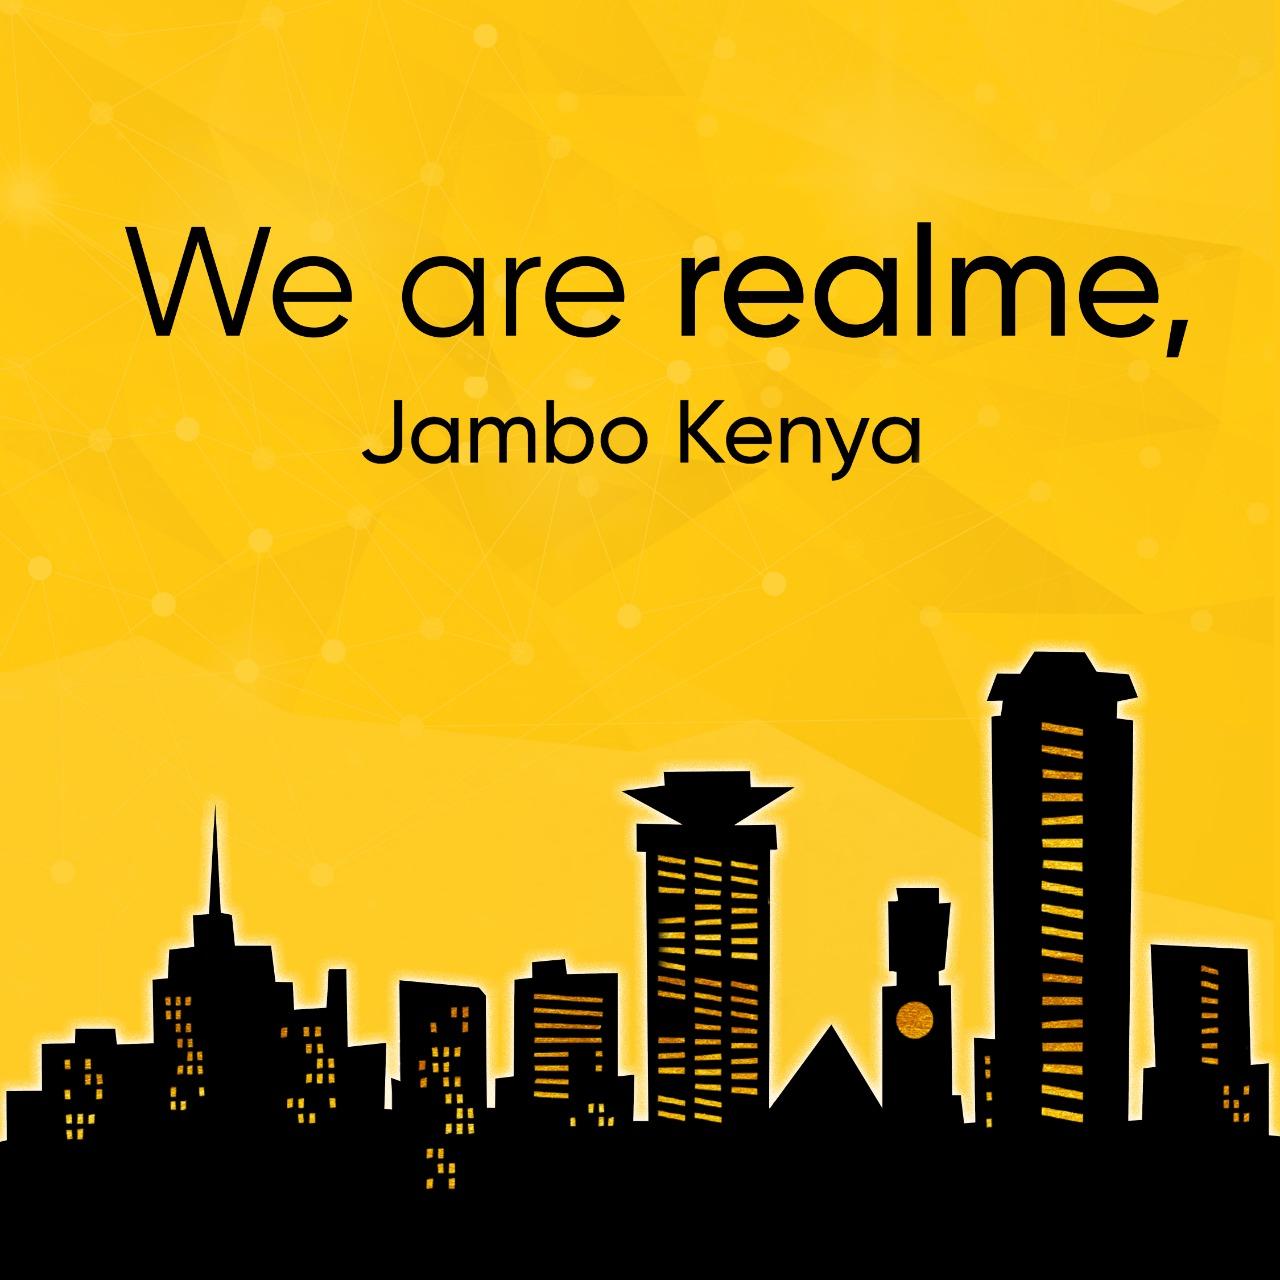 New smartphone brand Realme enters Kenyan Market